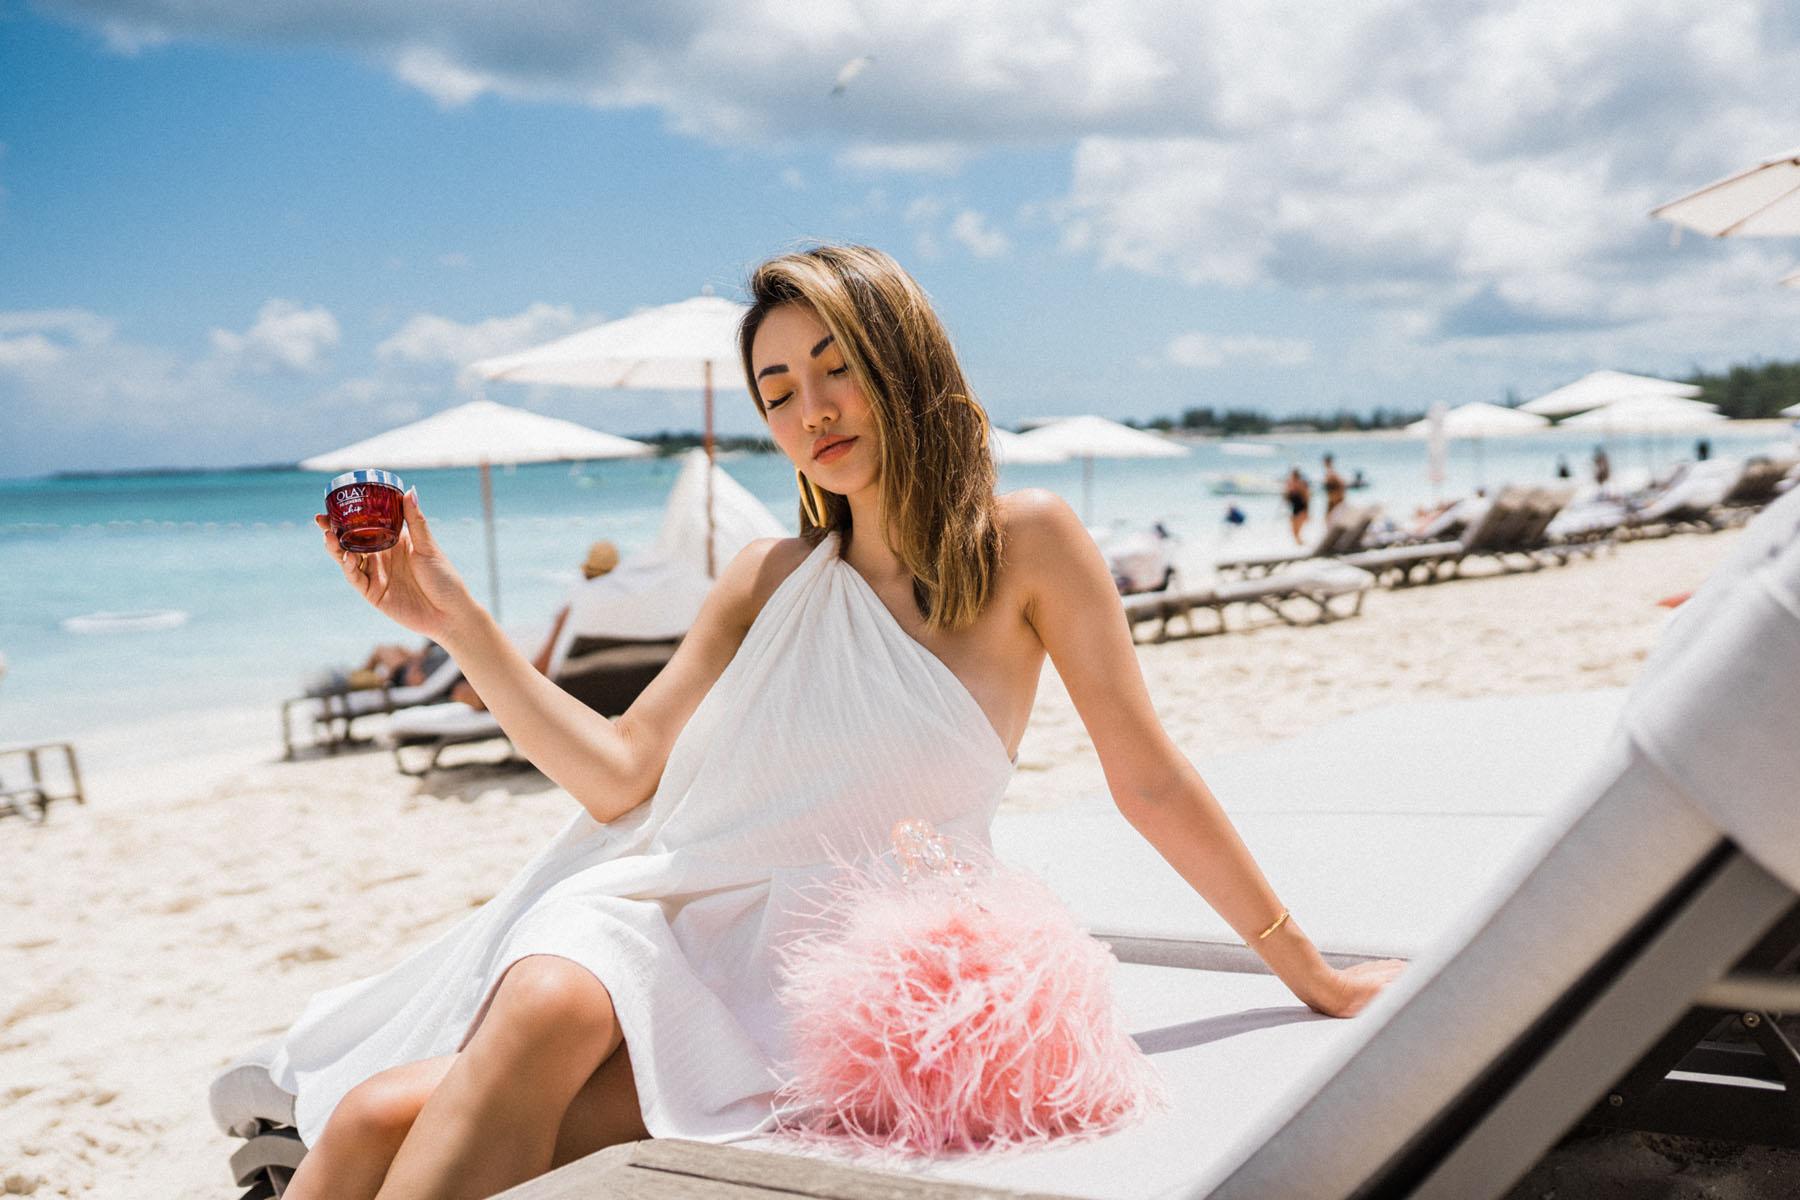 essential moisturizers for fresh summer skin, olay regenerist // Notjessfashion.com